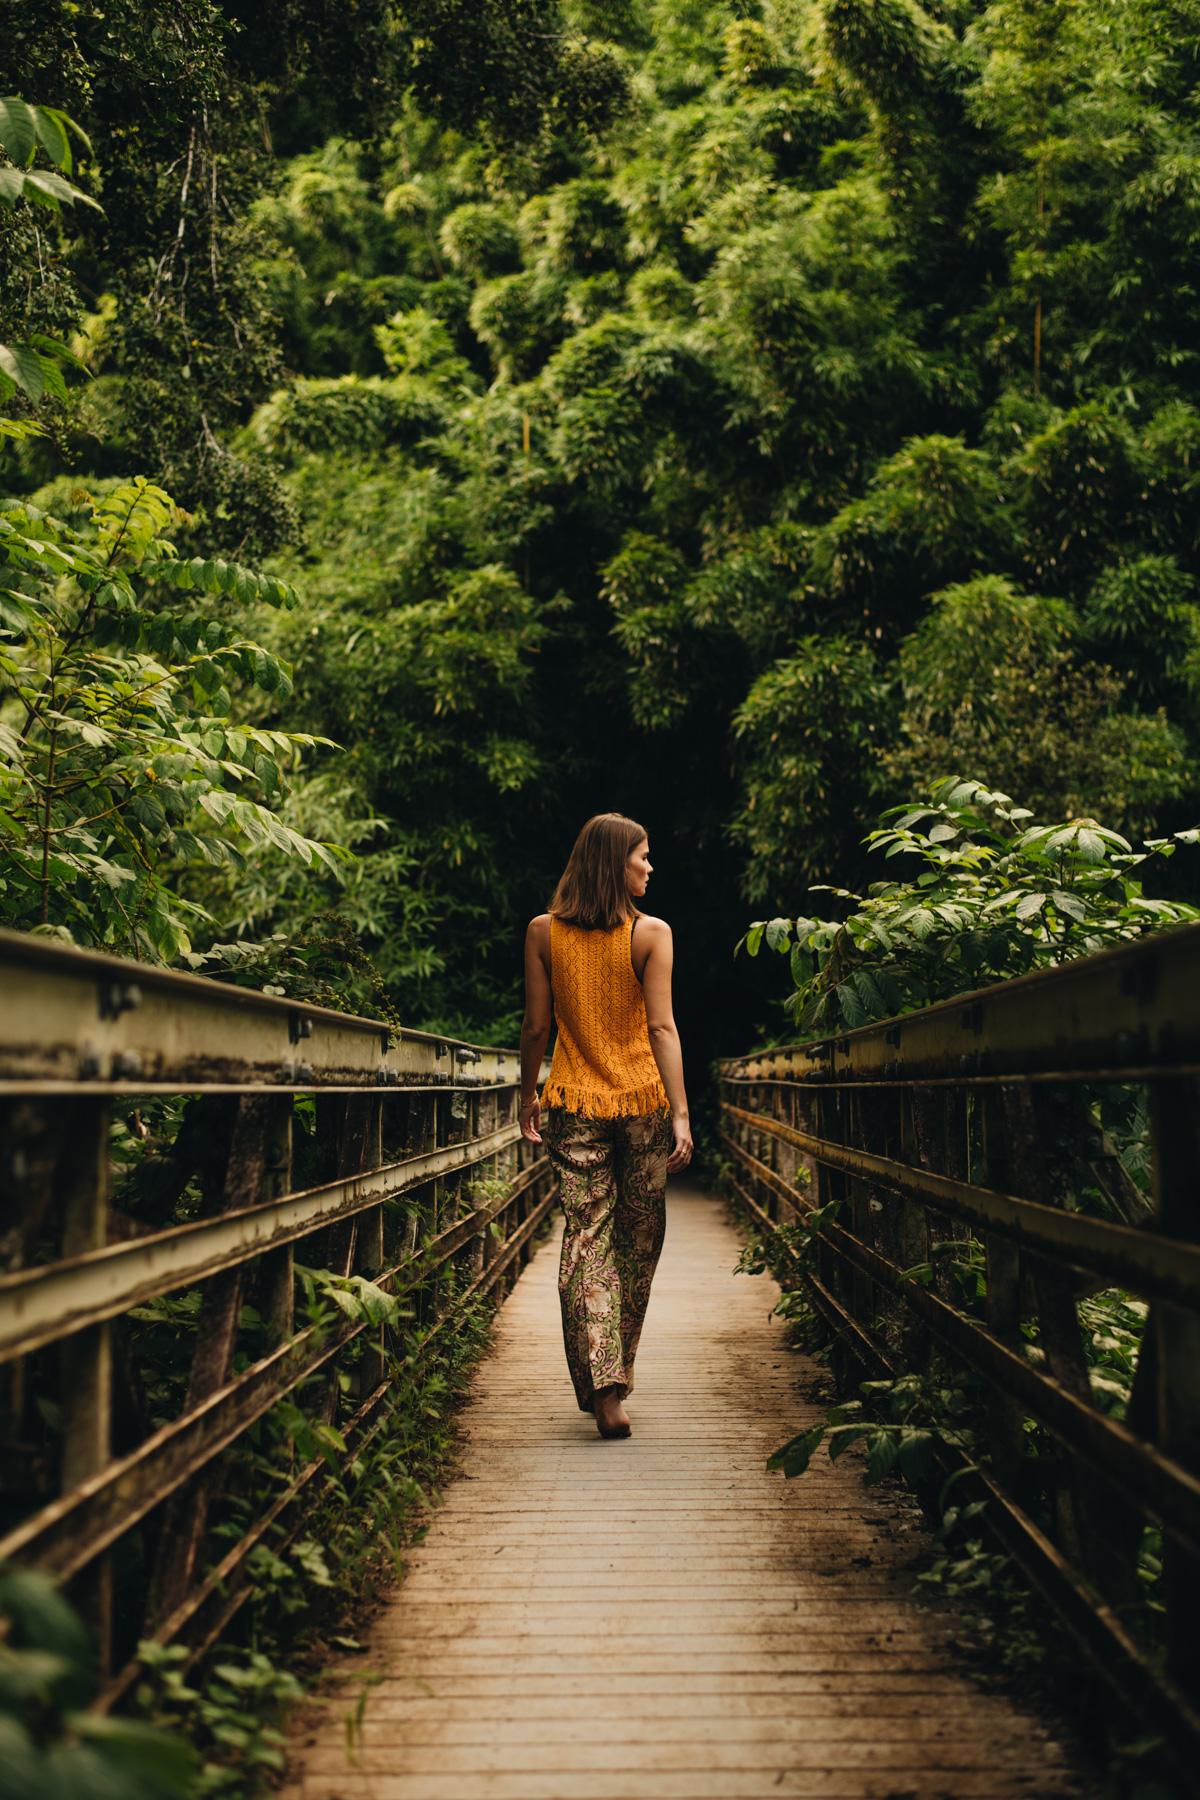 Road to Hana Haleakala National Park Kipahulu Bridge bamboo forest